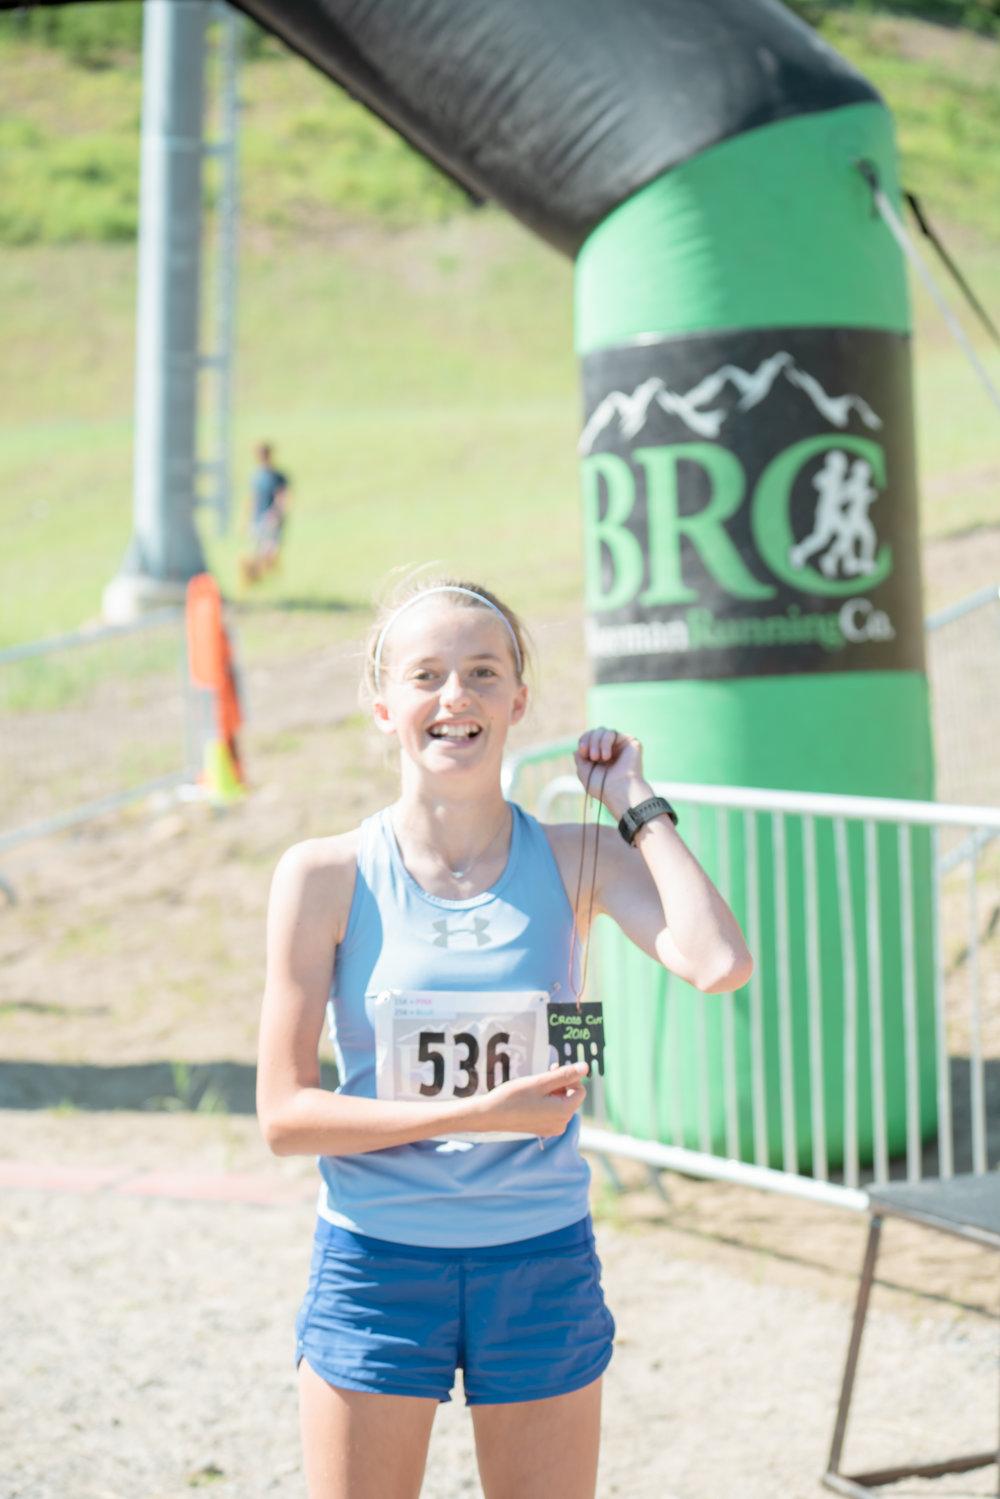 A runner getting her reward at Bozeman Running Co. racing of Crosscuts at Bridger Bowl just north of Bozeman, Montana.